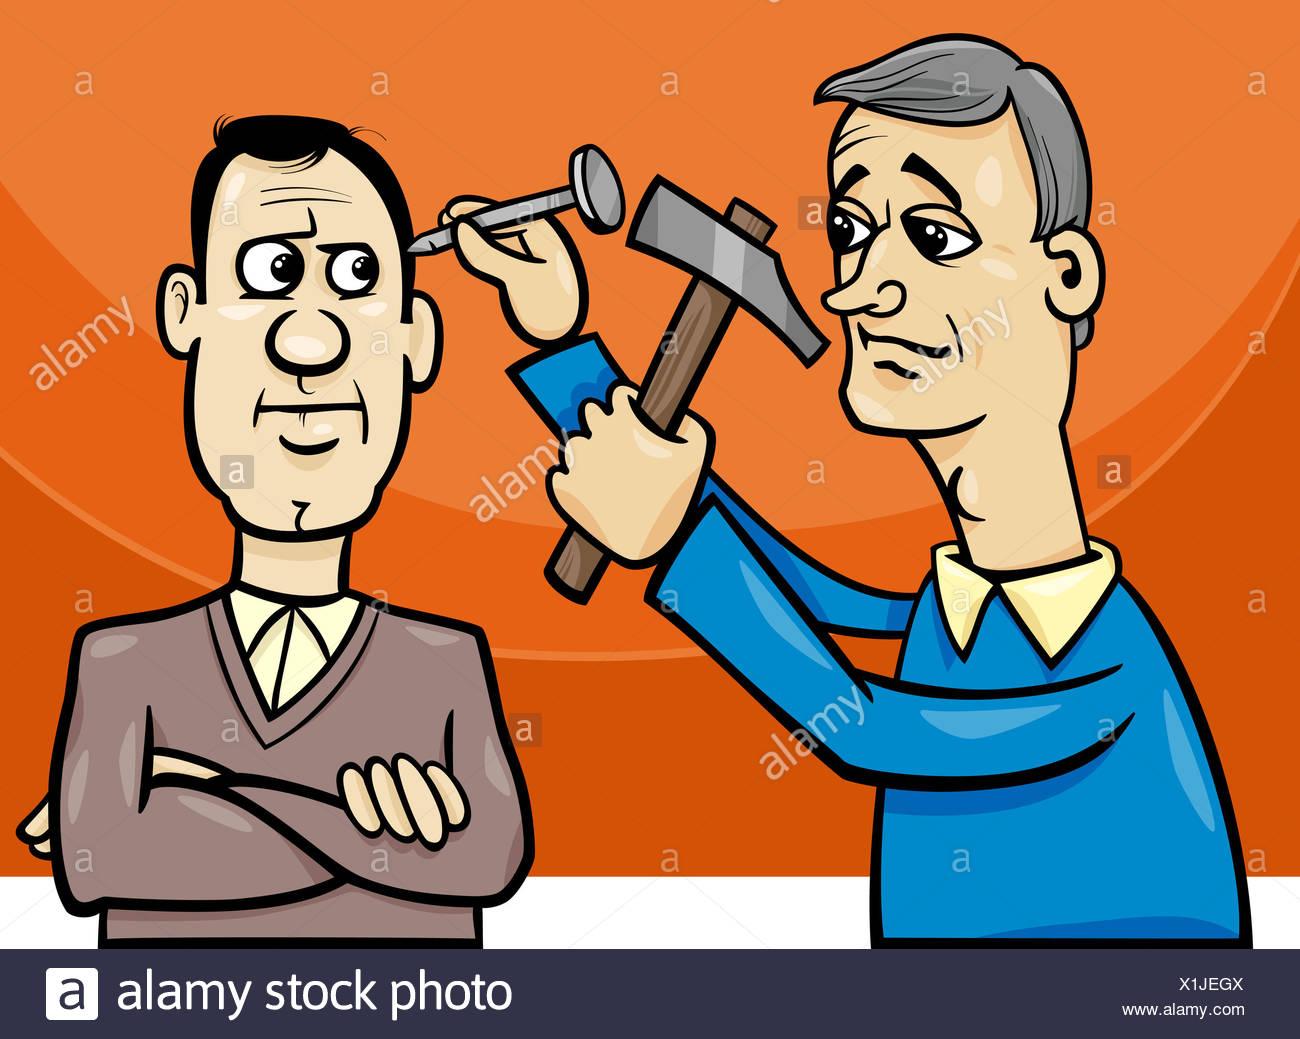 hit the nail on the head cartoon Stock Photo: 276387130 - Alamy